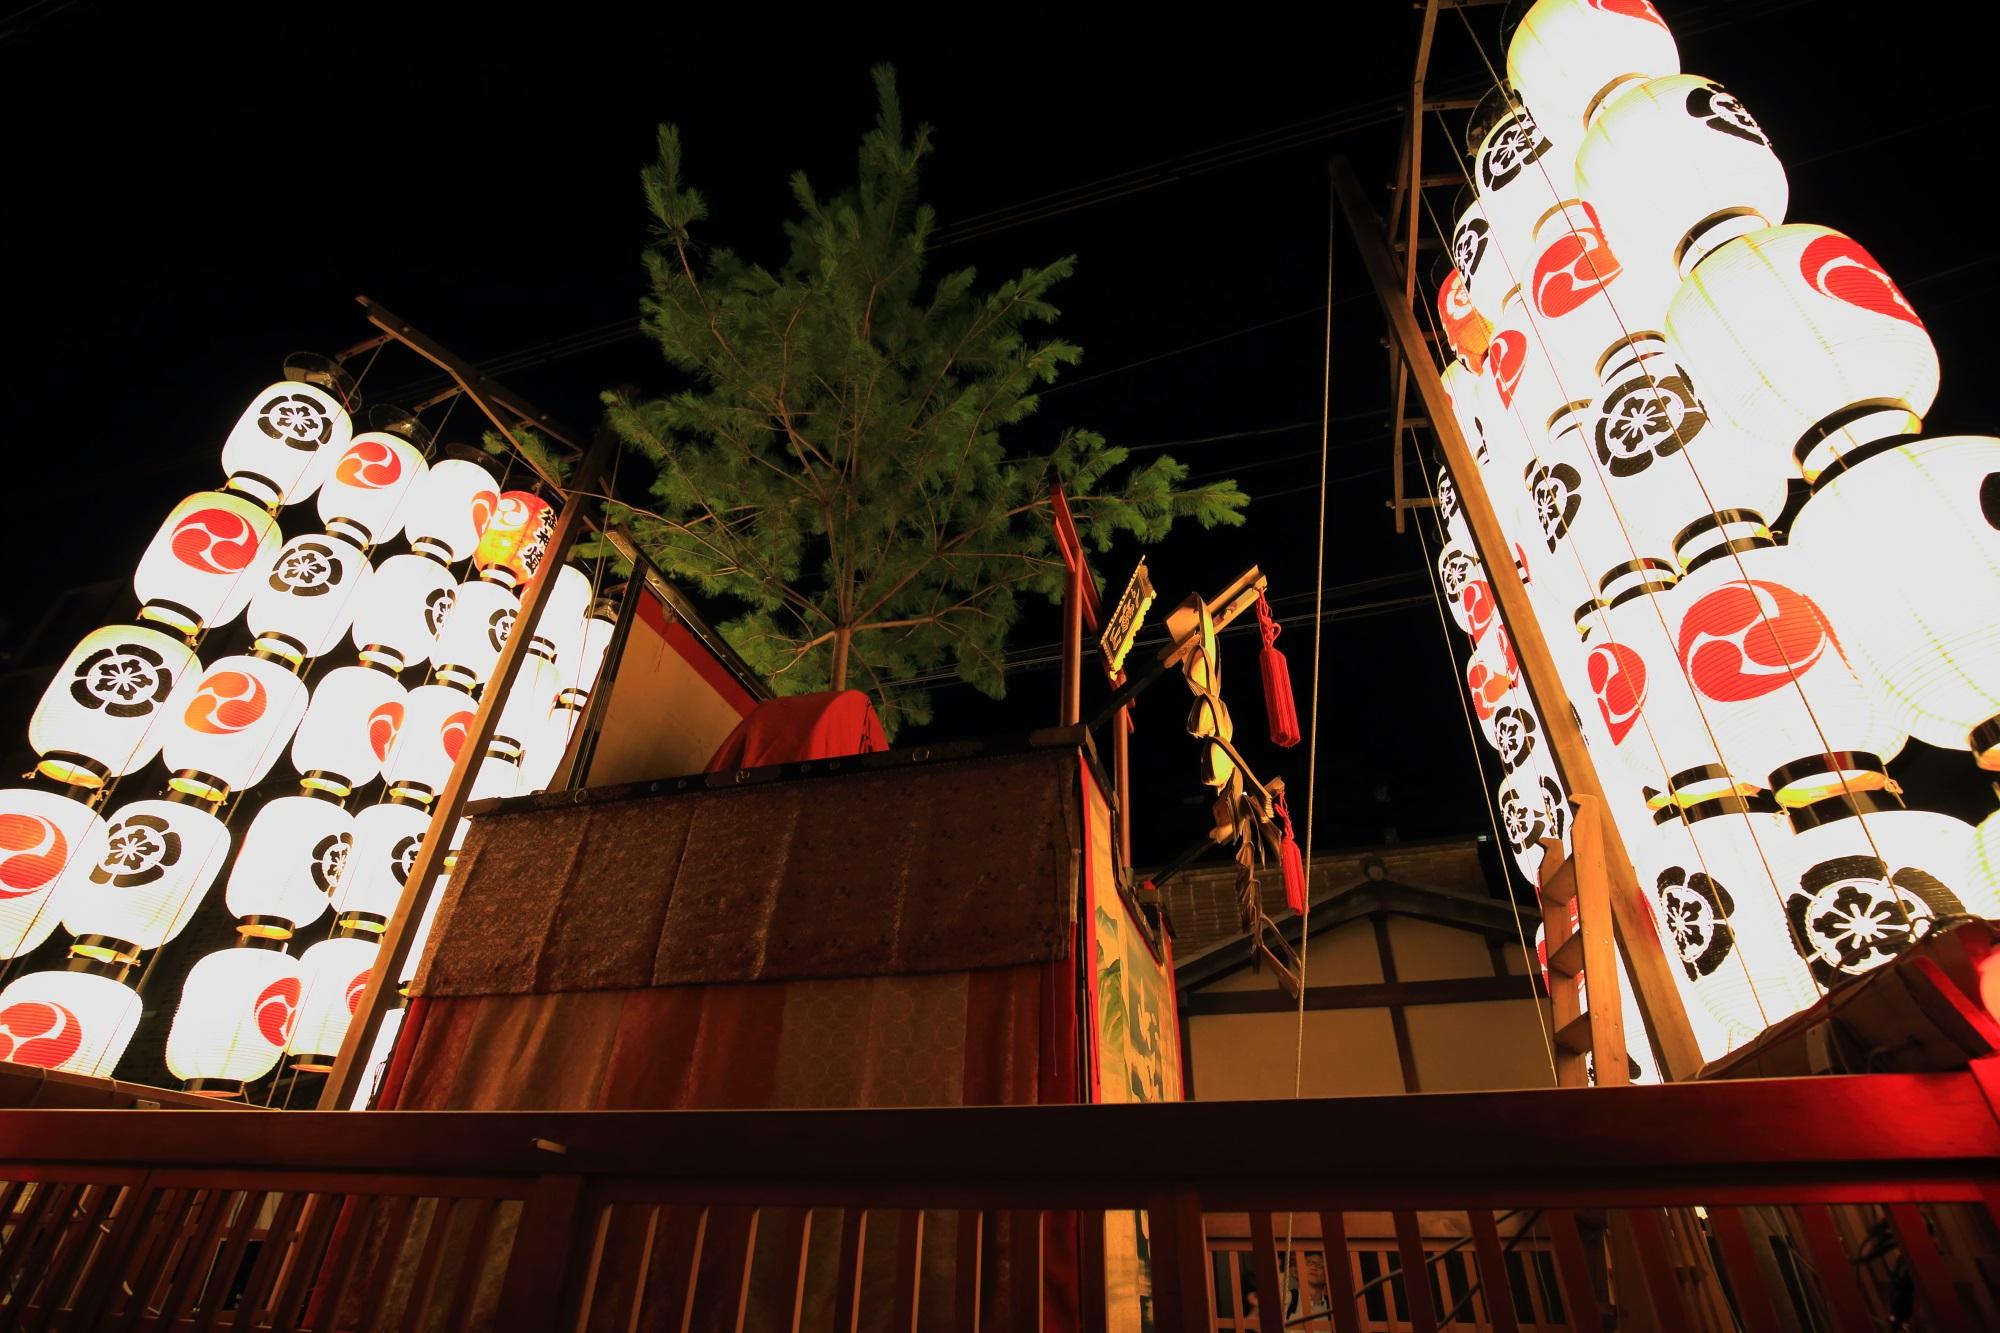 八幡山 宵山 駒形提灯 祇園祭 後祭 夏の風物詩